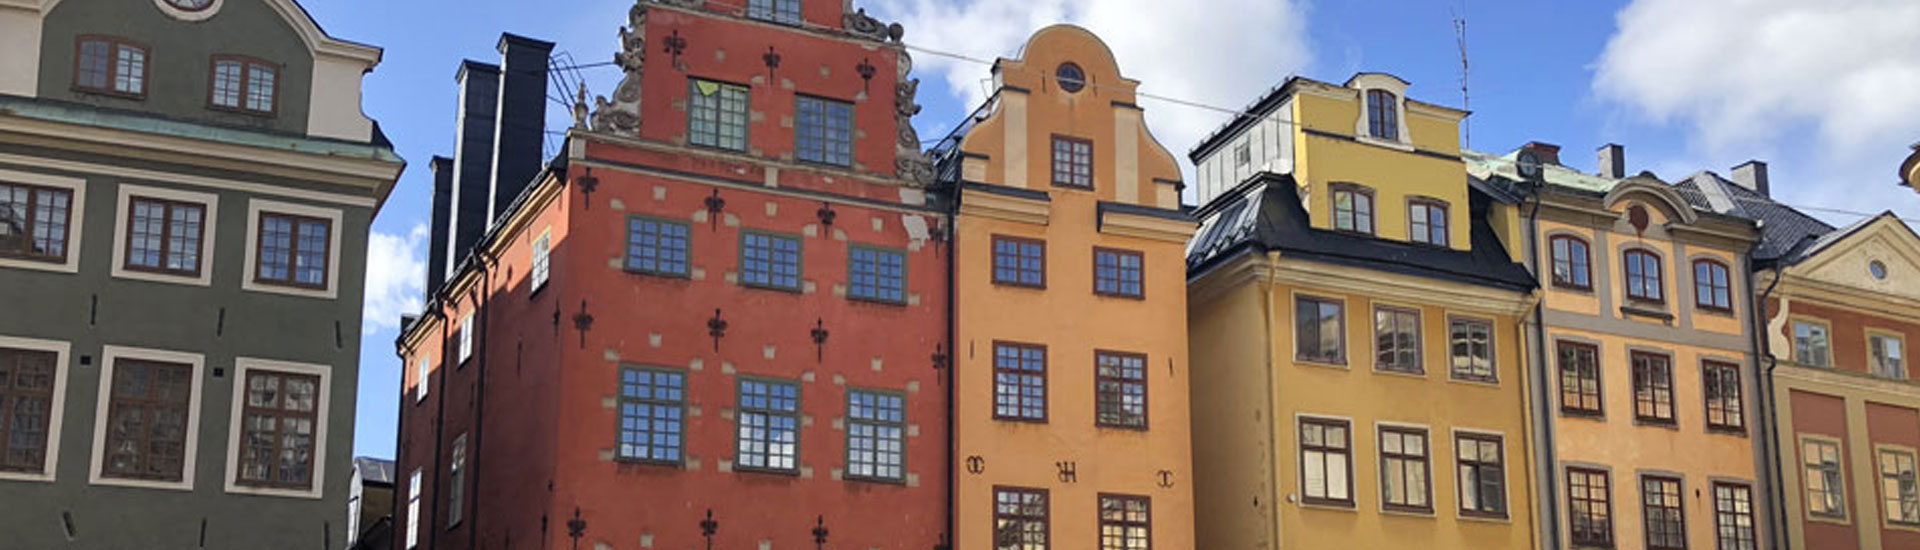 Stockholm-Geektouristique-cover